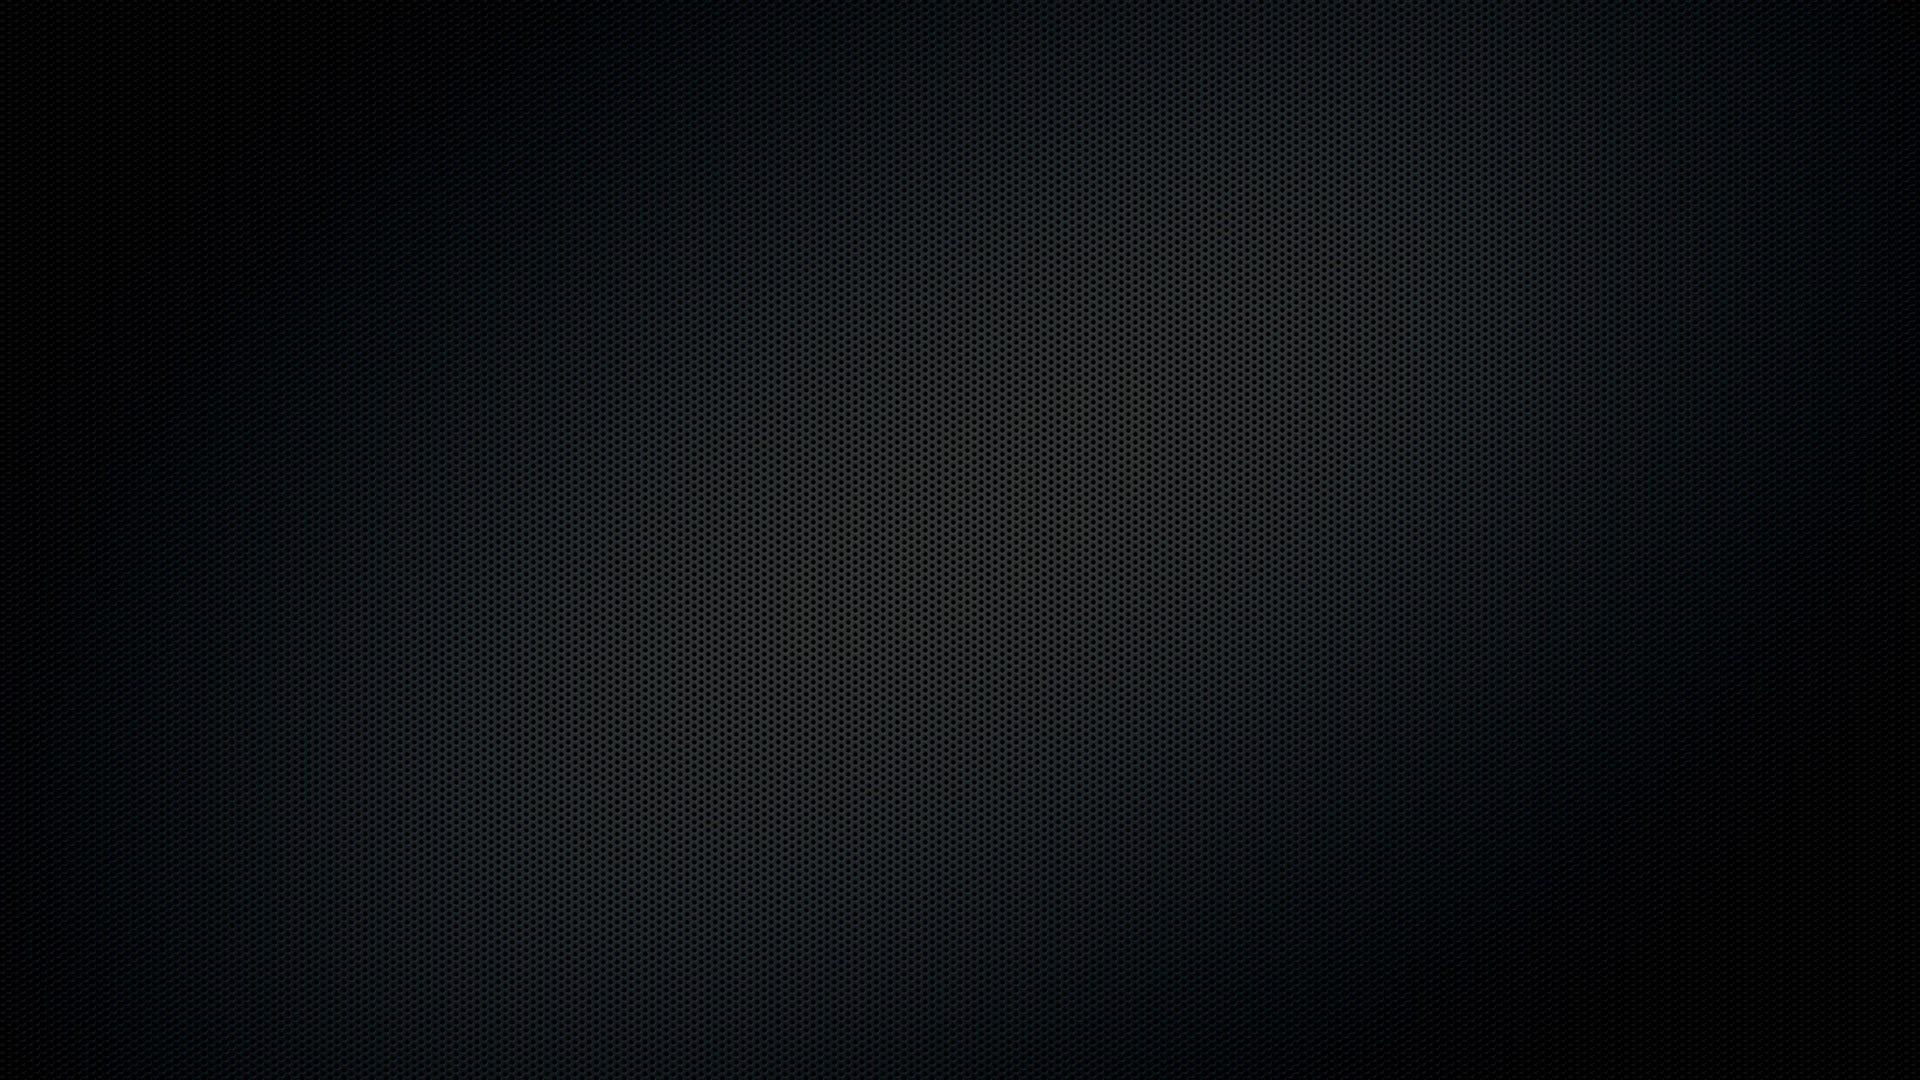 black hd wallpaper 1920x1080 10 free wallpaper